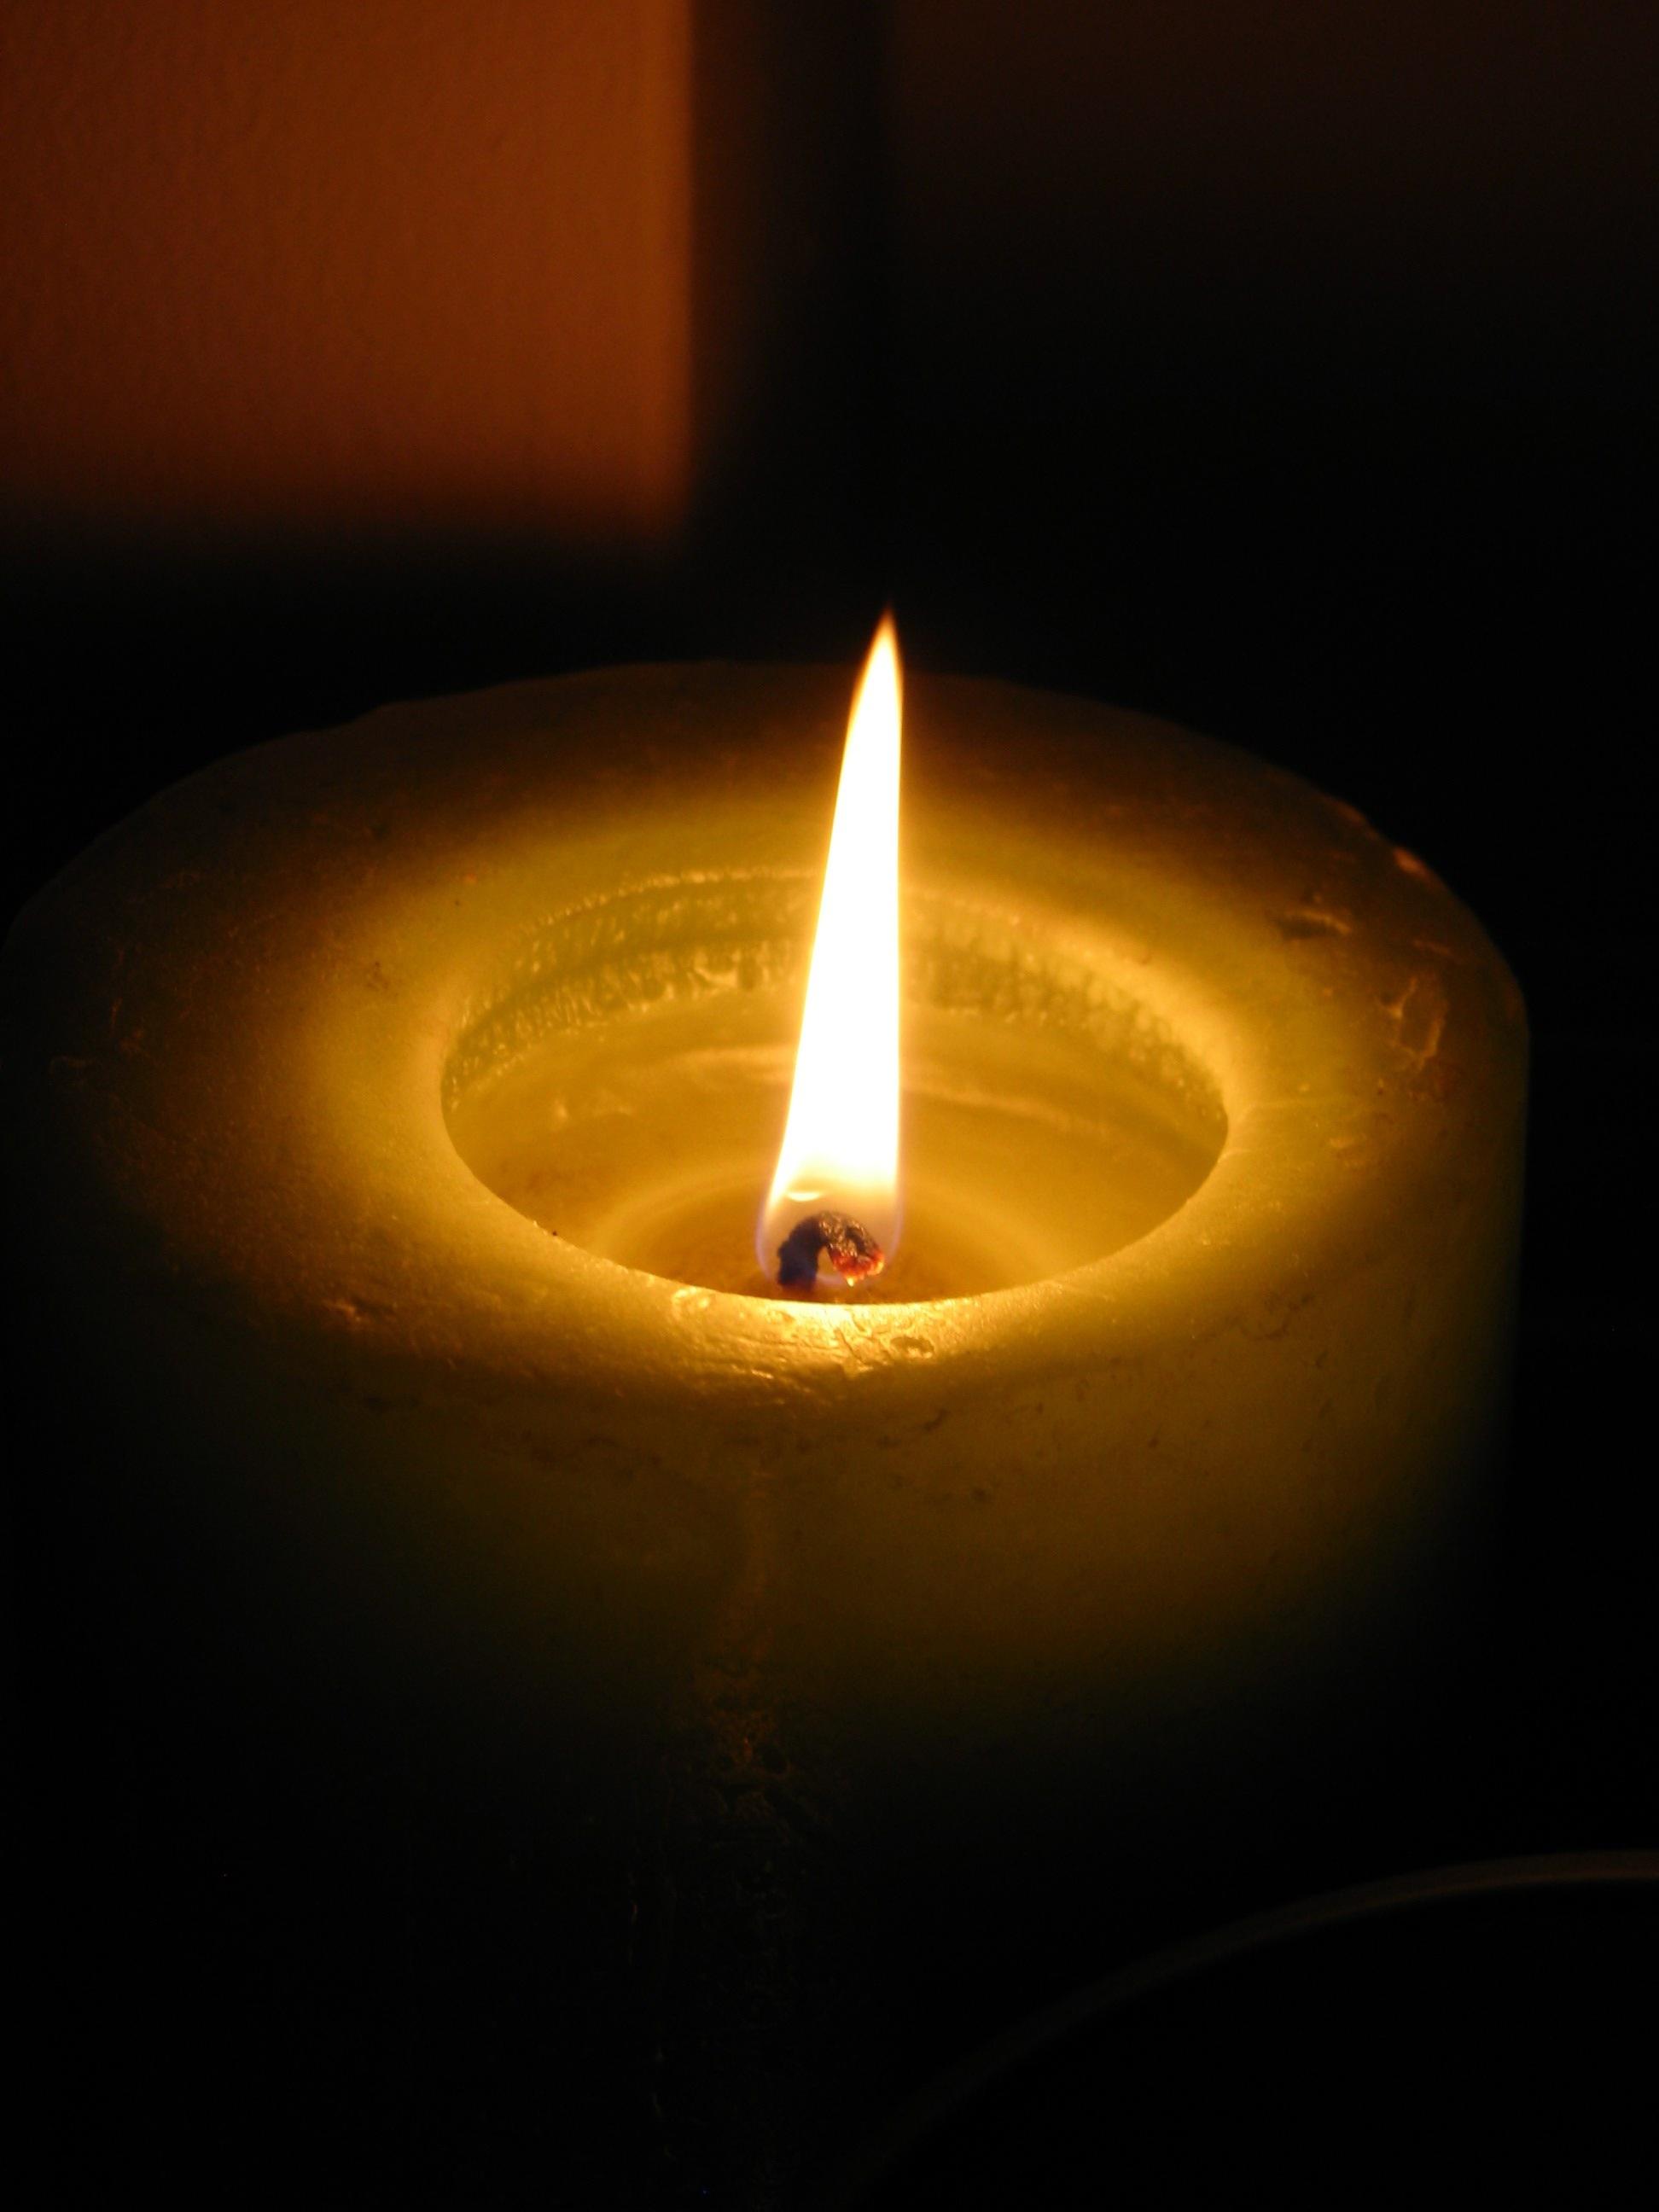 Картинки свеча для одноклассников